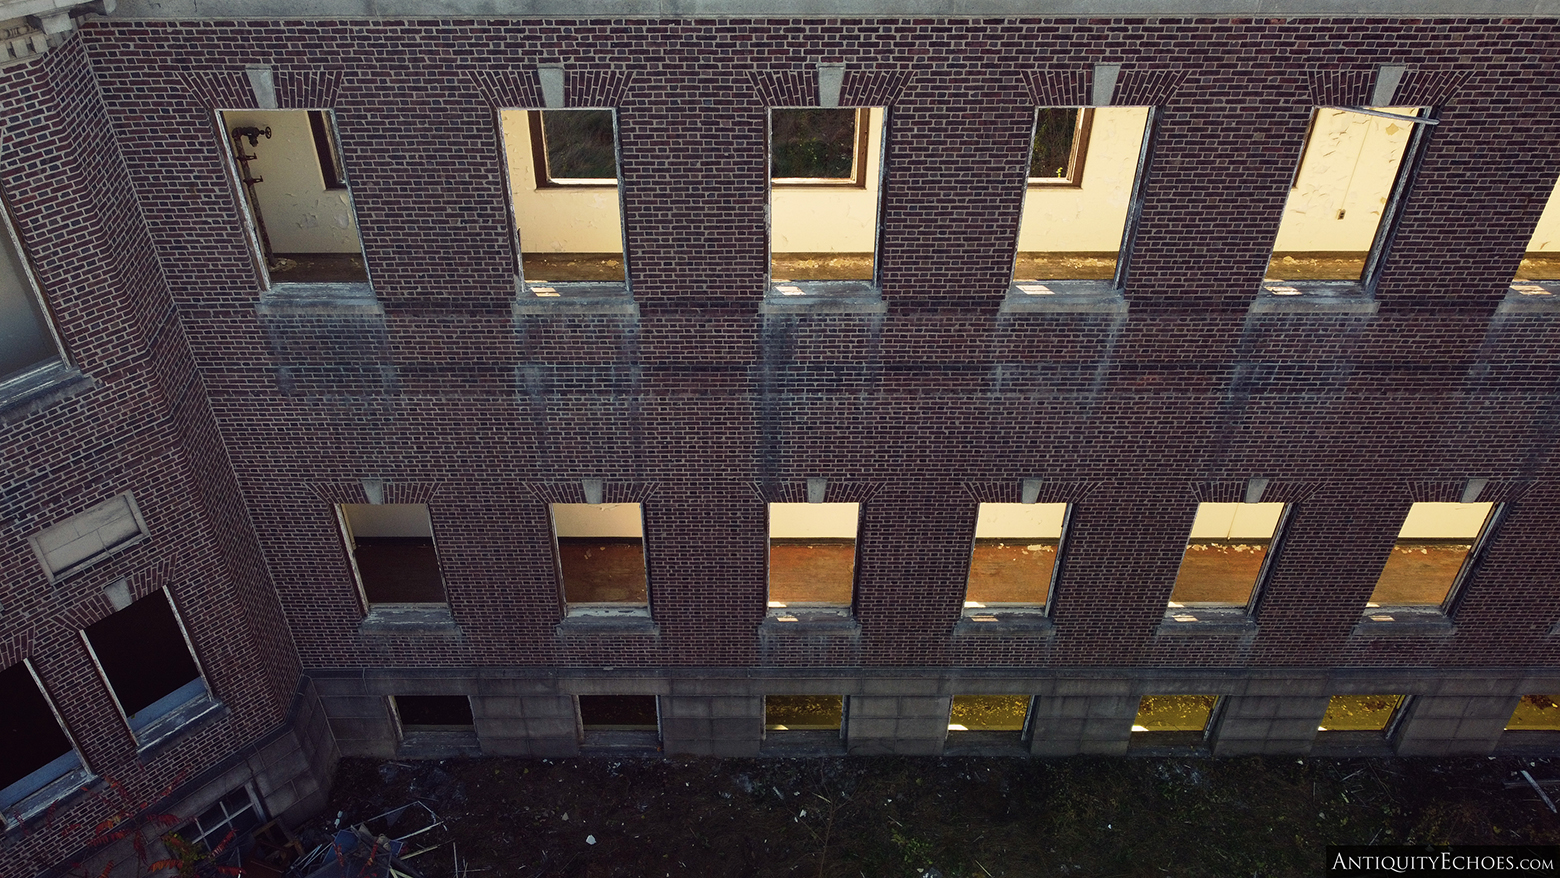 Allentown State Hospital - Windowless